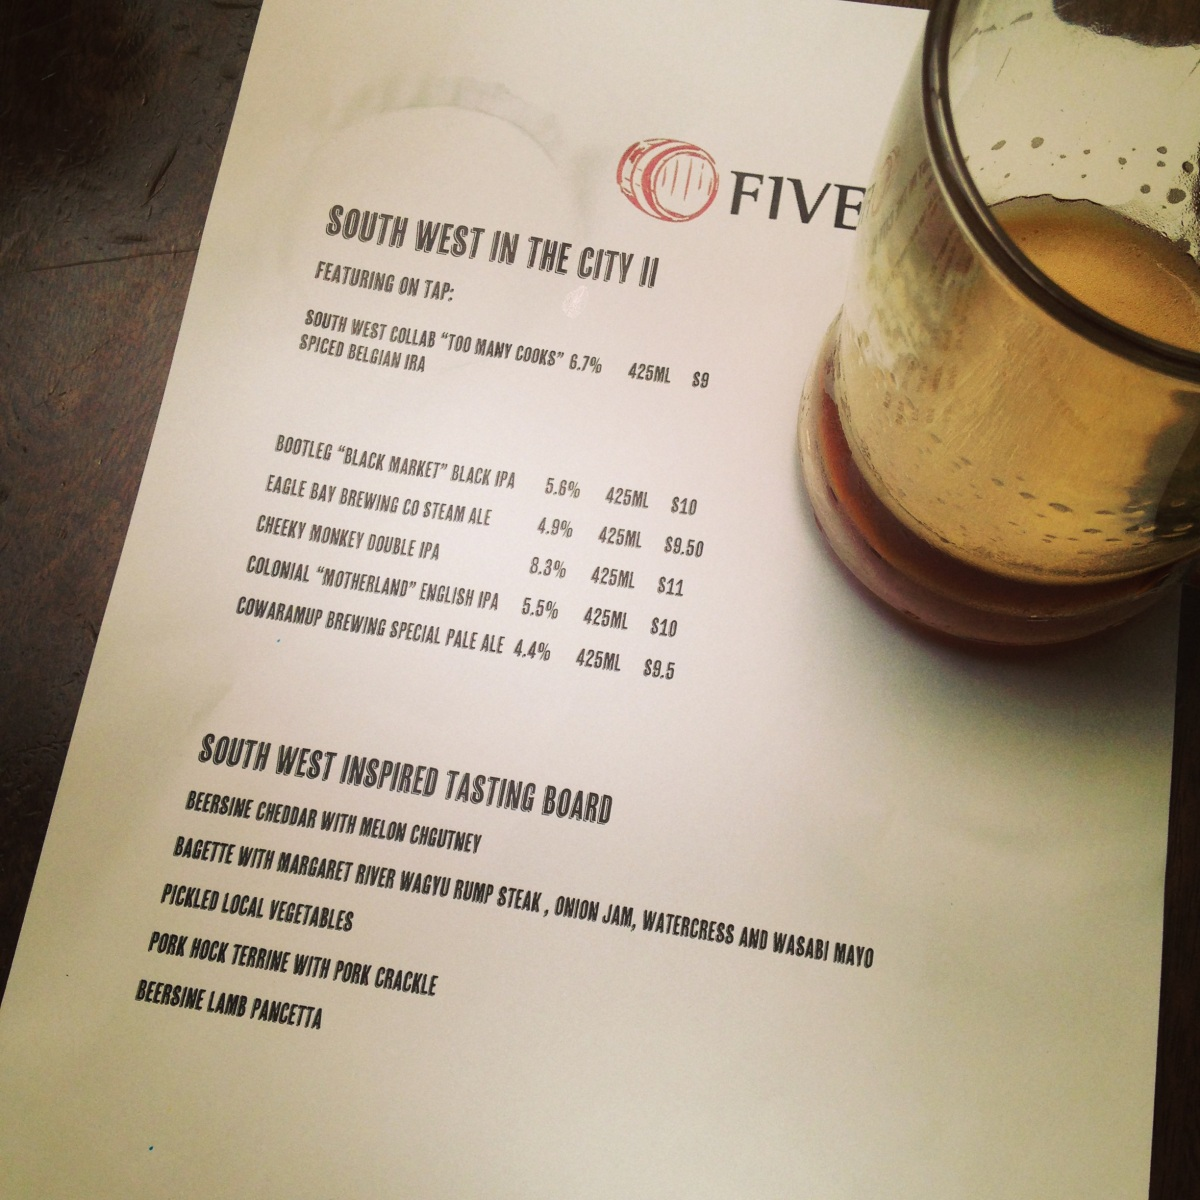 WA Beer Week: South West in the CityII